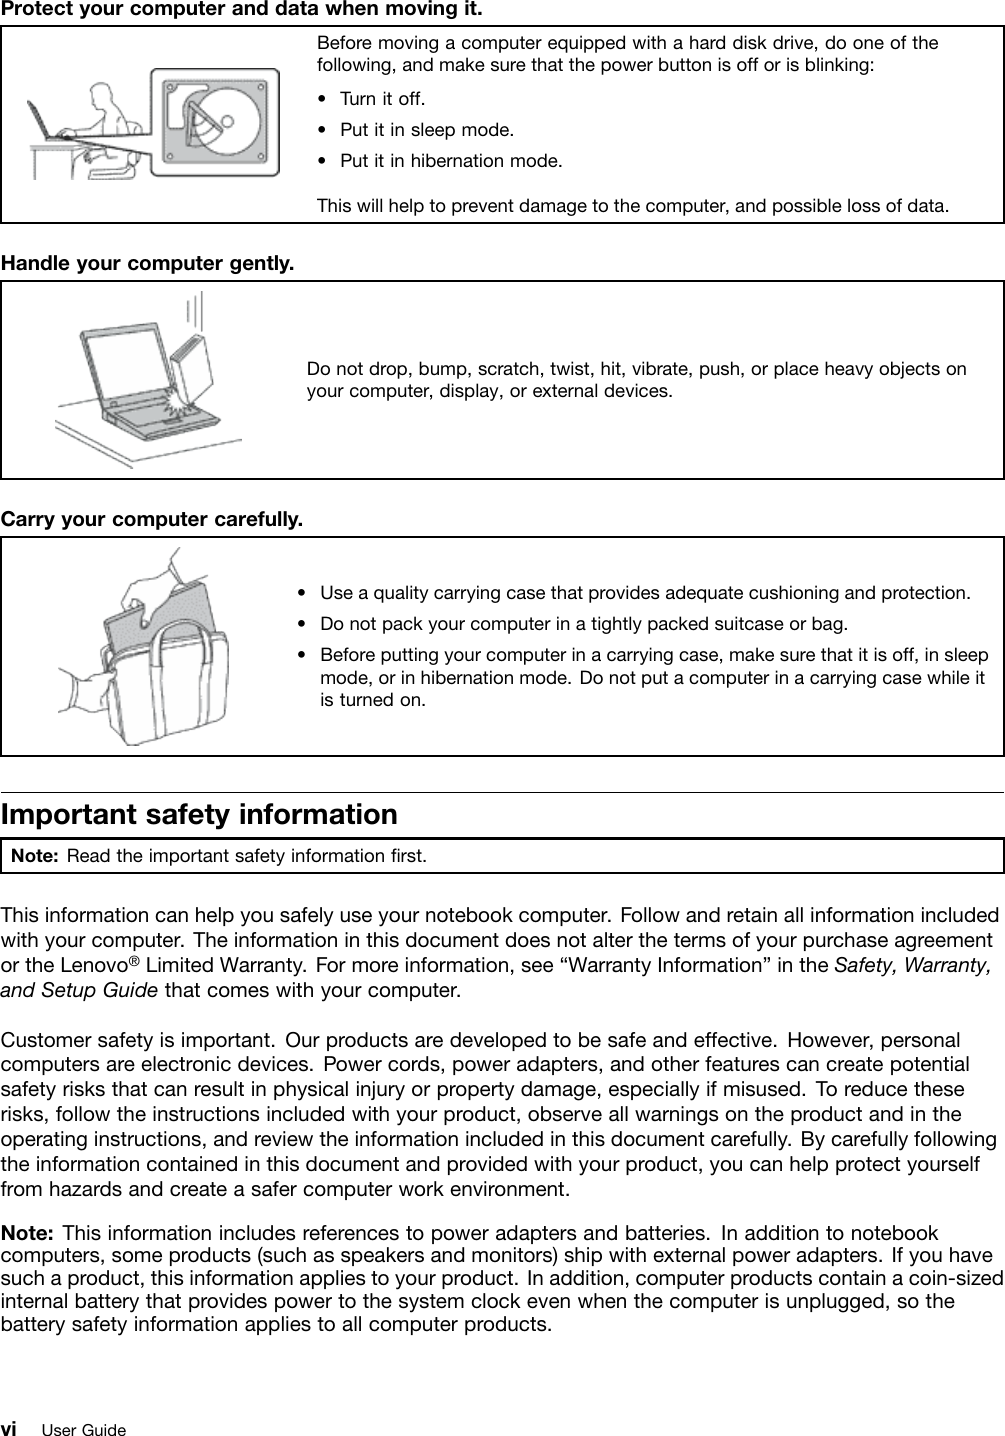 Lenovo Thinkpad X230 Tablet Users Manual ManualsLib Makes It